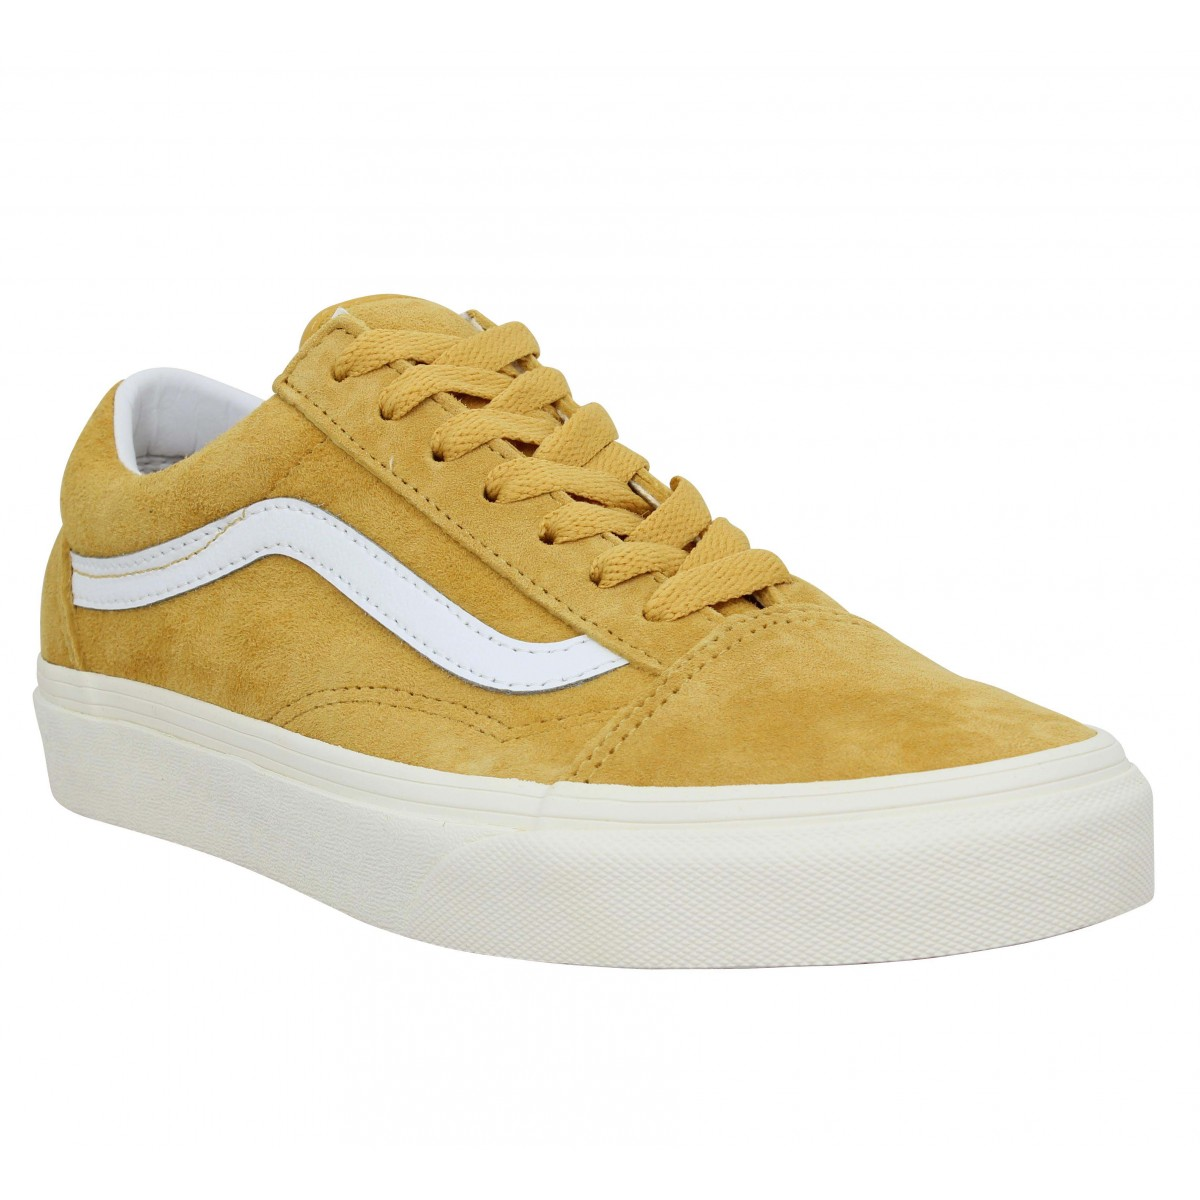 Baskets VANS Old Skool velours Honey Gold